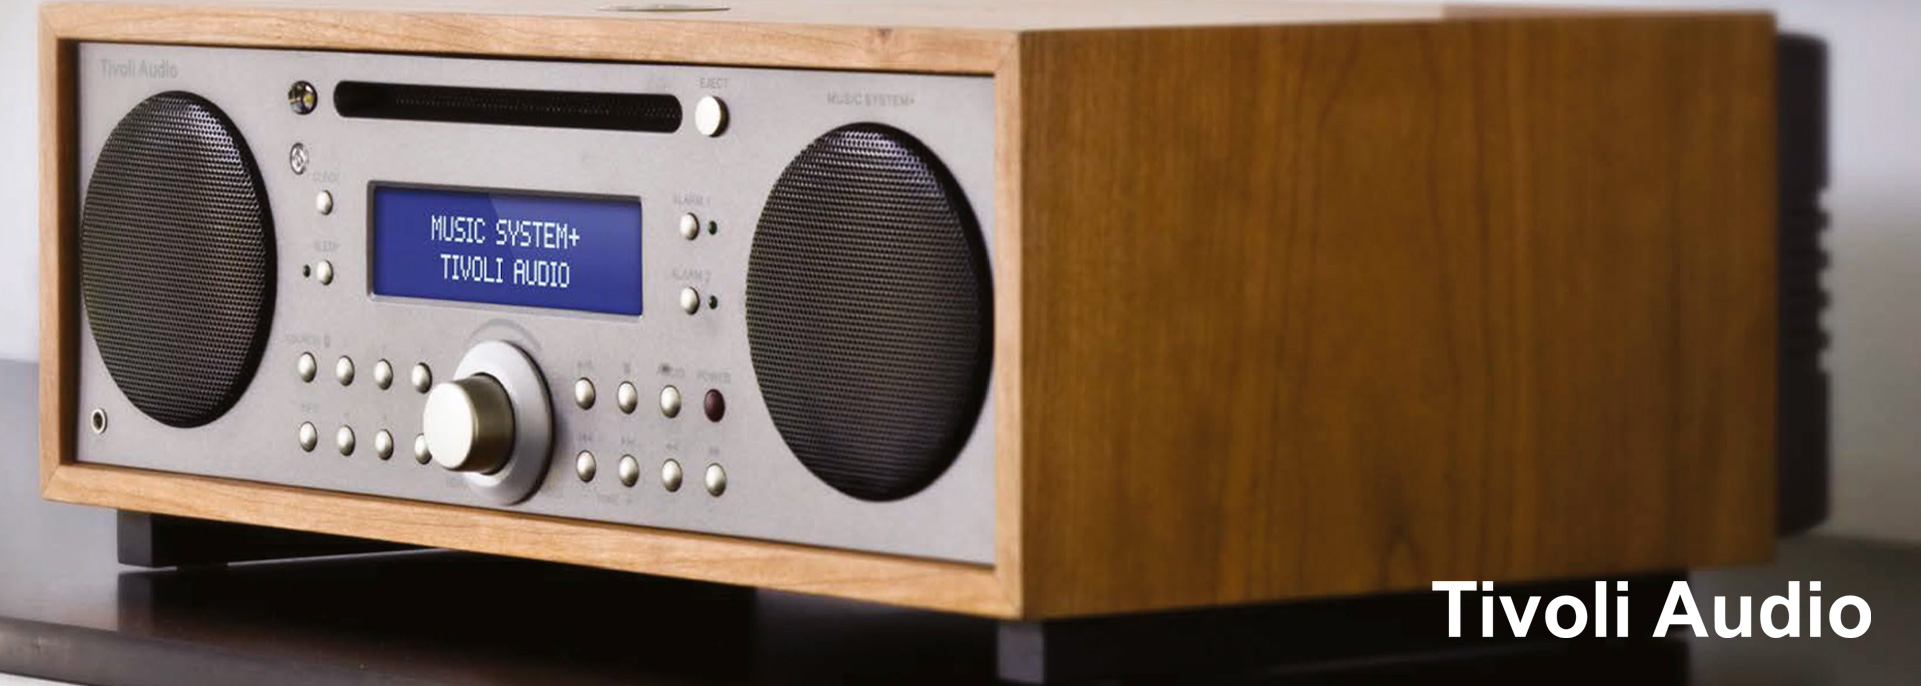 Tivoli Audio System